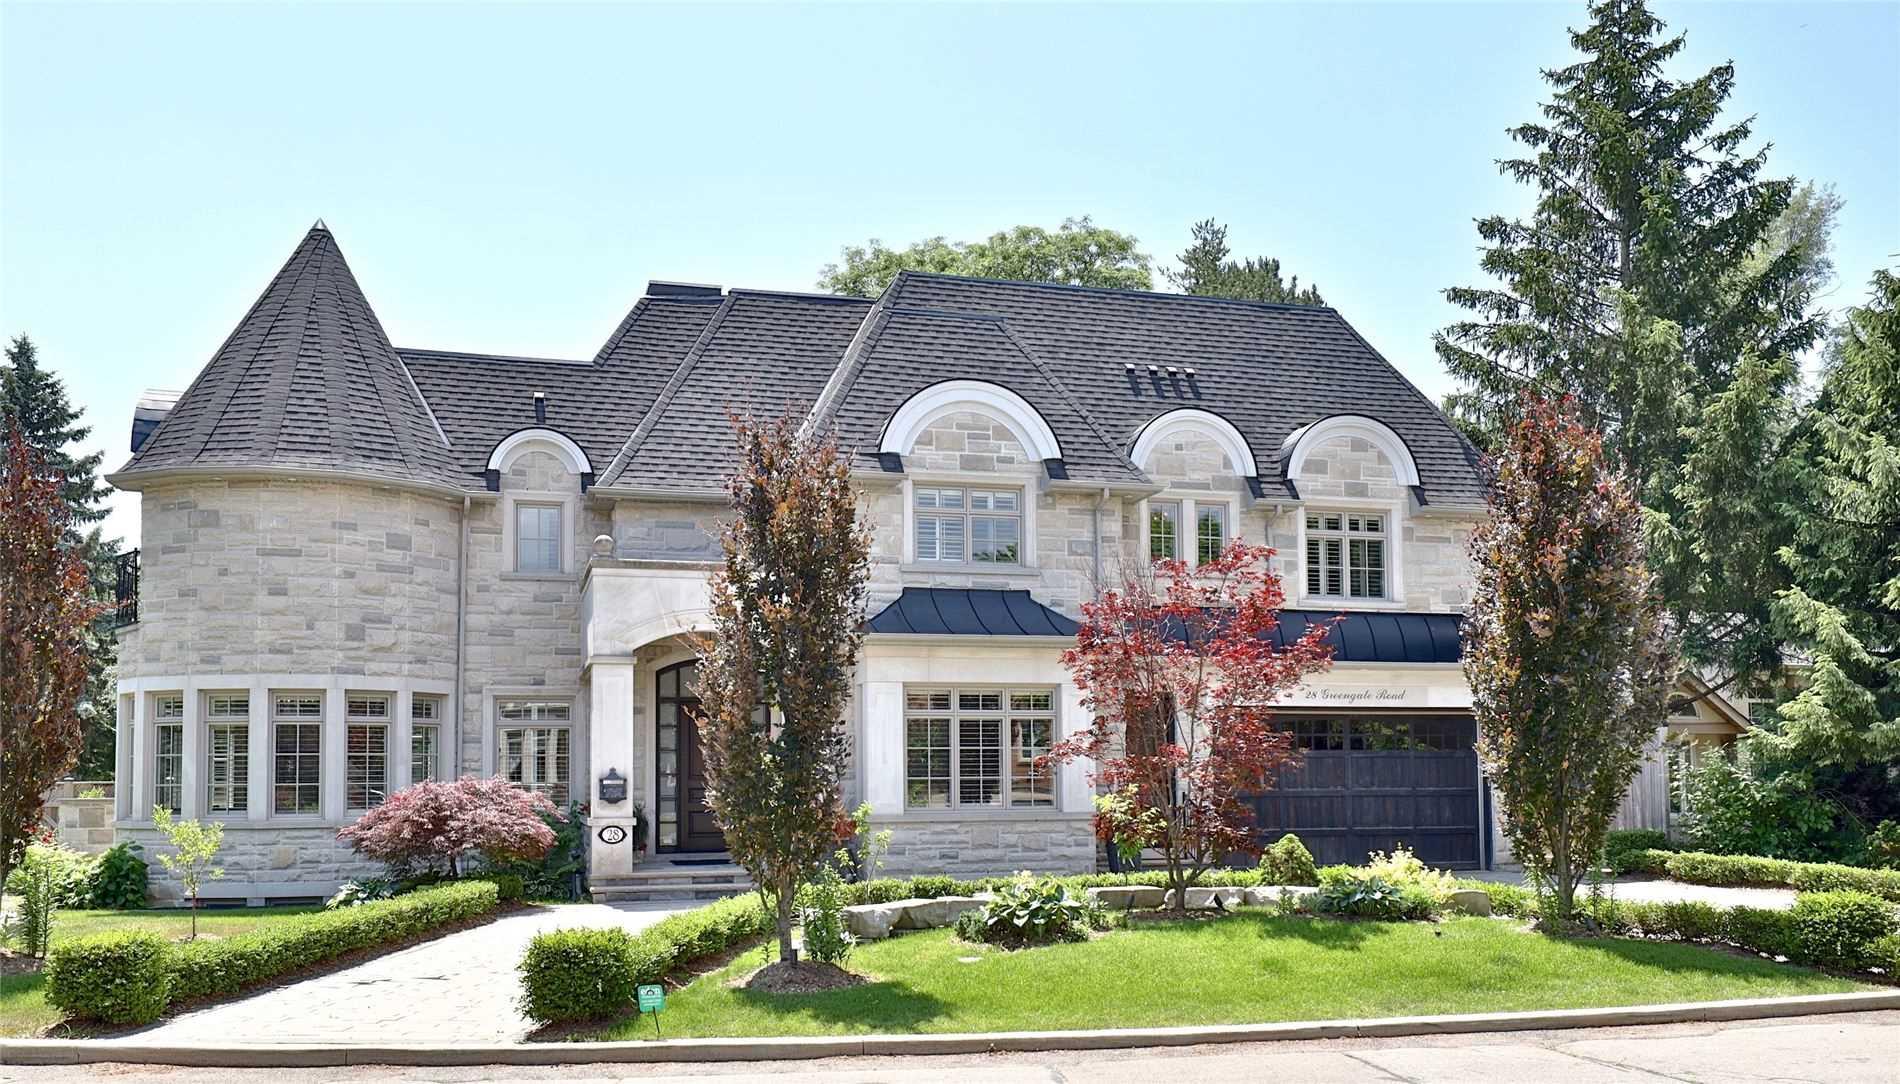 28 Greengate Rd, Toronto, Ontario M3B1E8, 5 Bedrooms Bedrooms, 15 Rooms Rooms,8 BathroomsBathrooms,Detached,For Sale,Greengate,C4960778